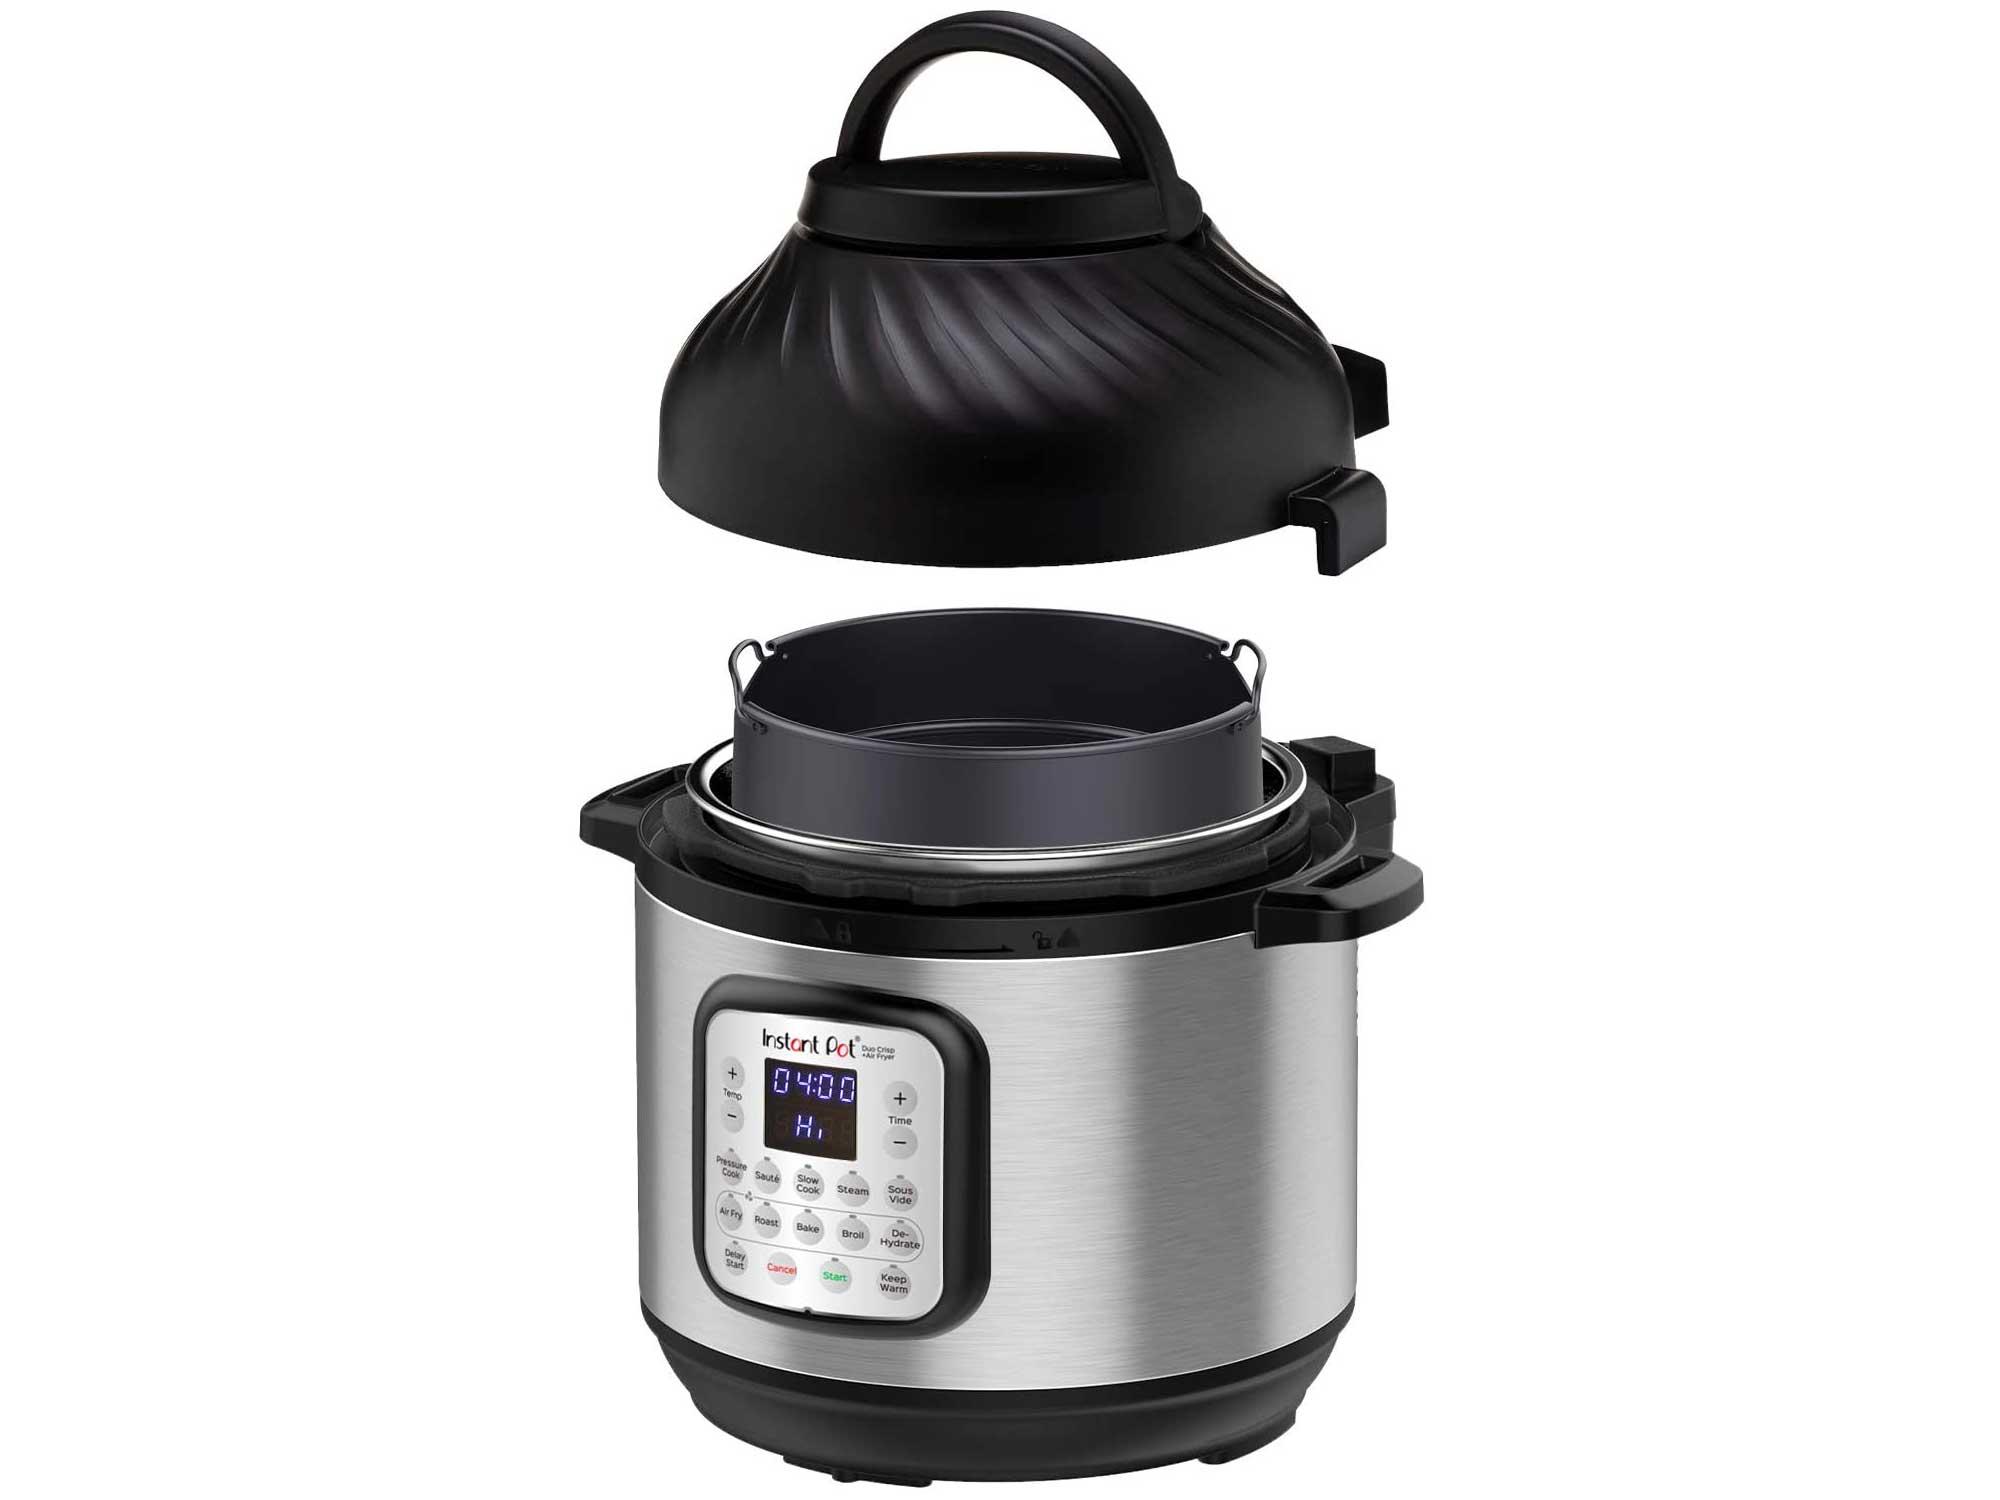 Instant Pot Duo Crisp Pressure Cooker